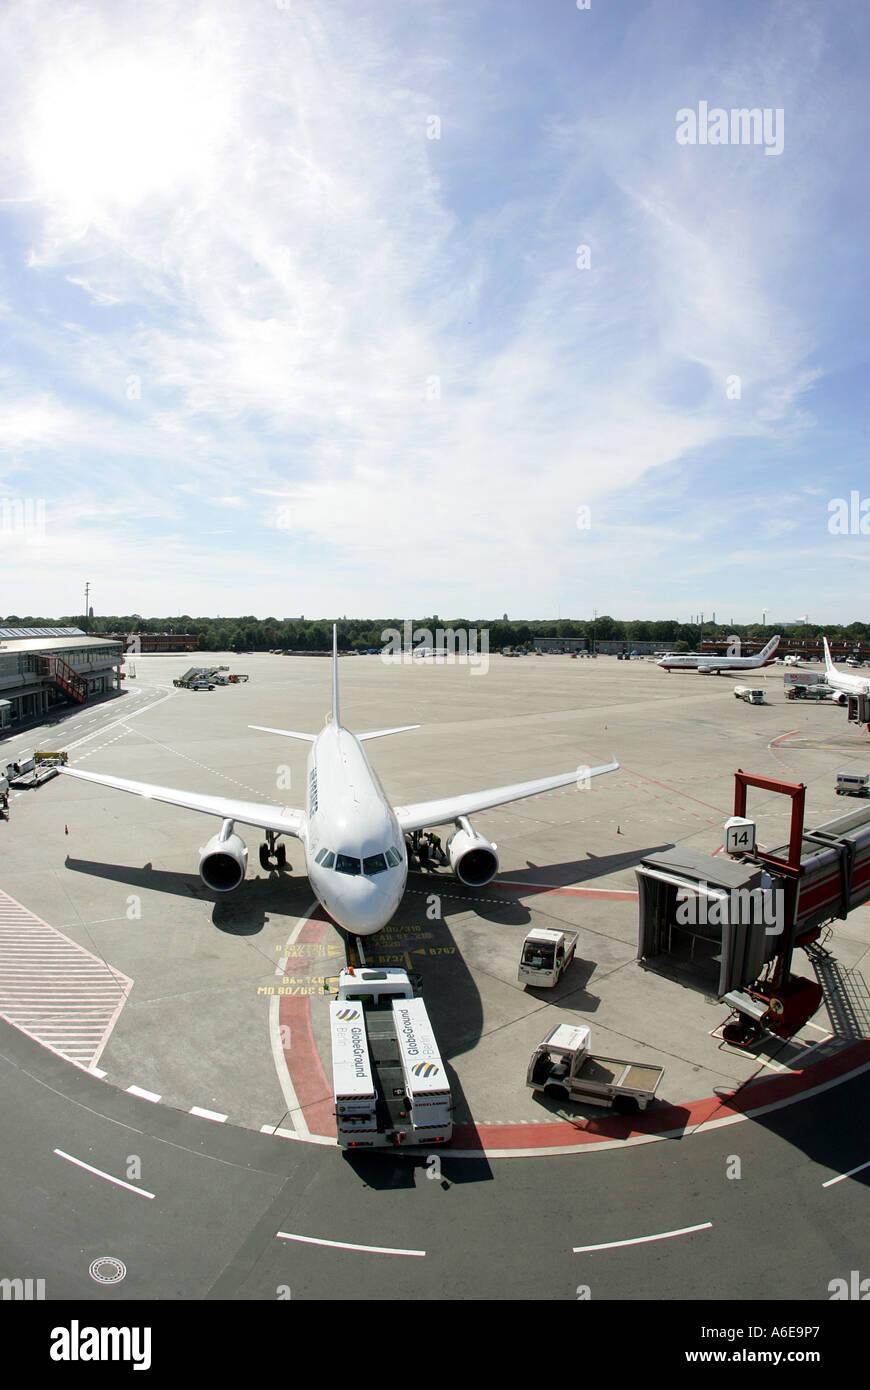 Airplane and boarding bridge at Tegel airport, Berlin - Stock Image